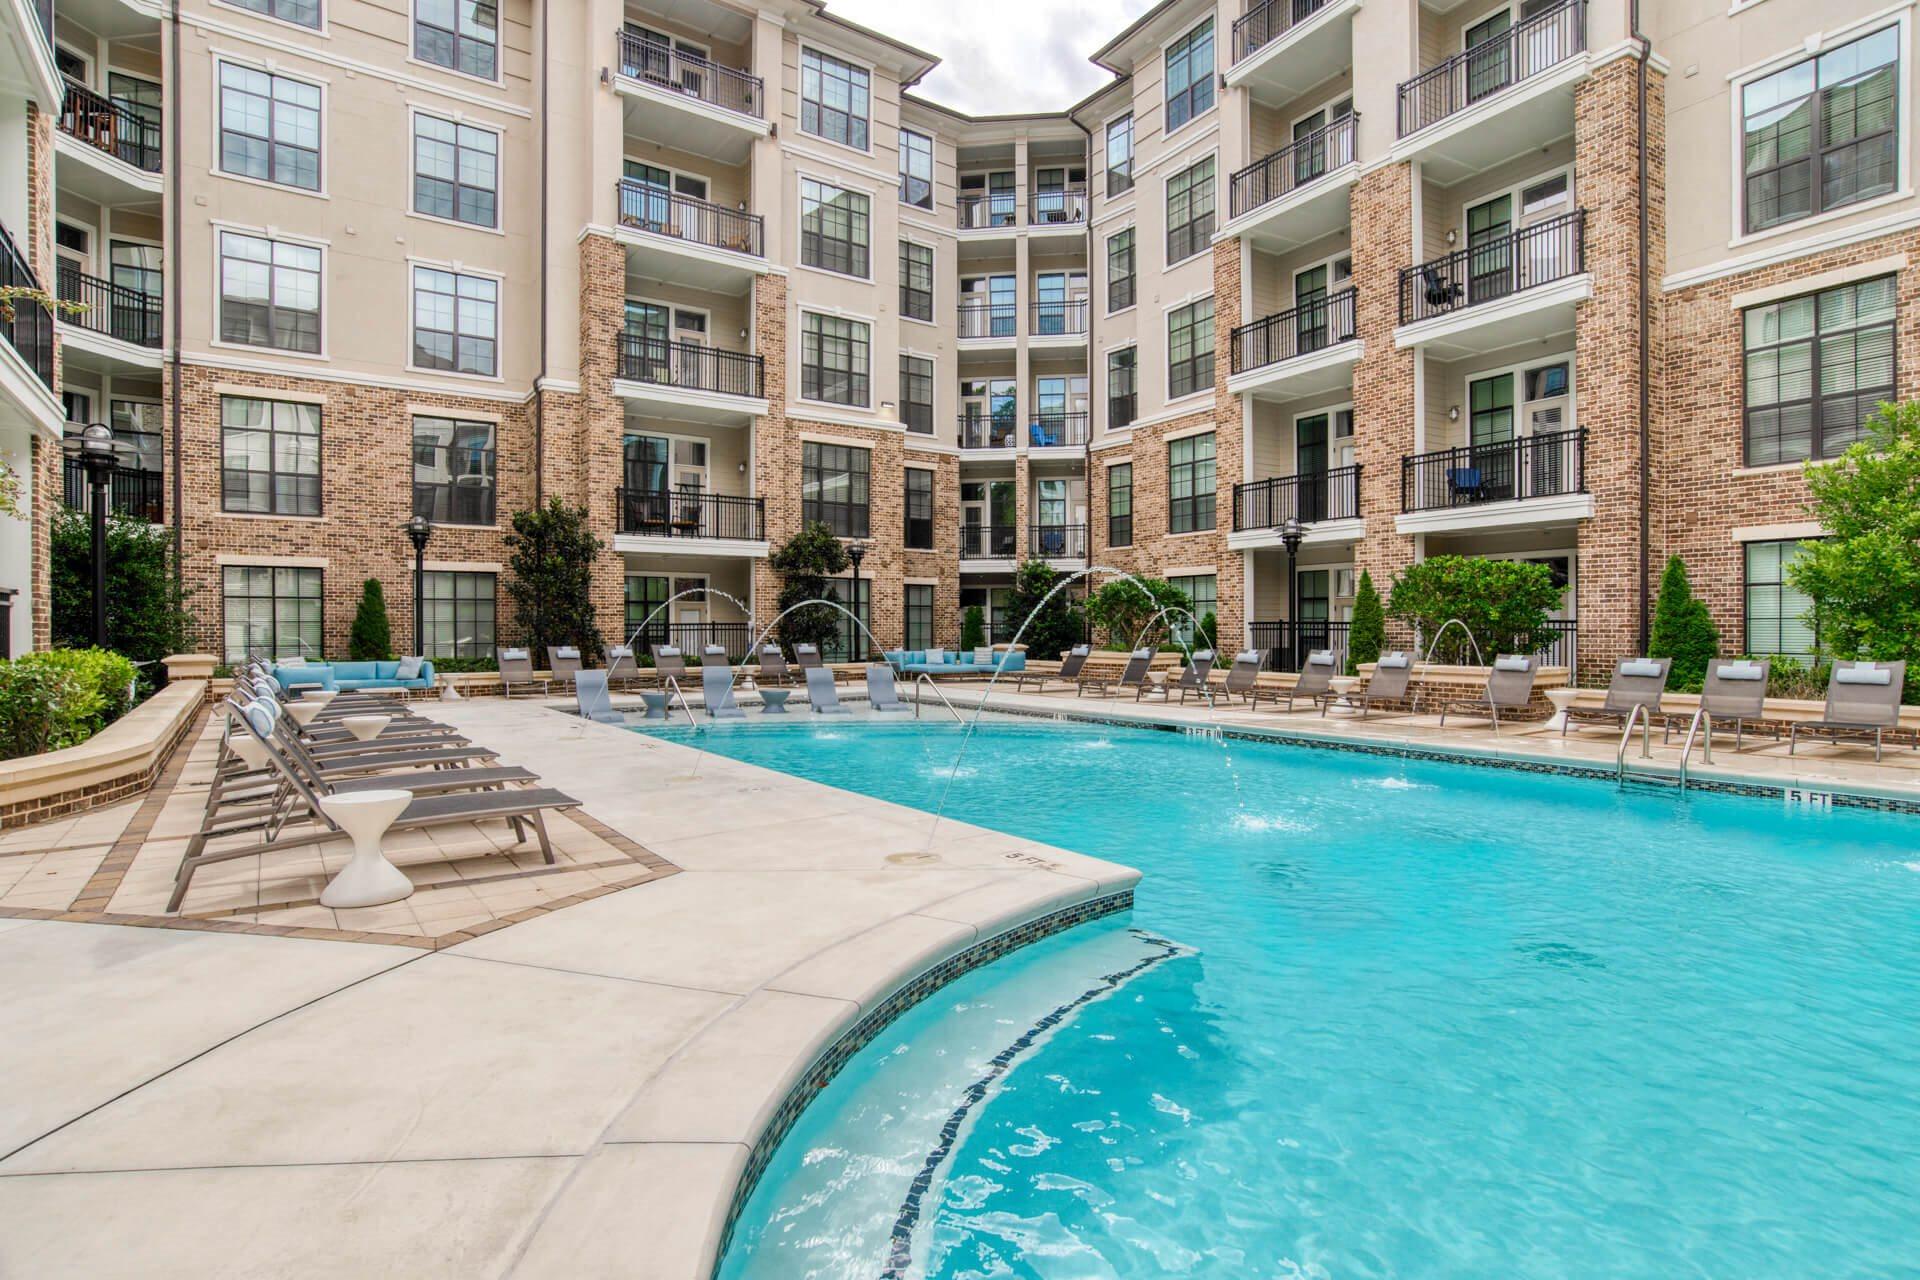 Pristine Swimming Pool at Windsor Chastain, 255 Franklin Rd, GA